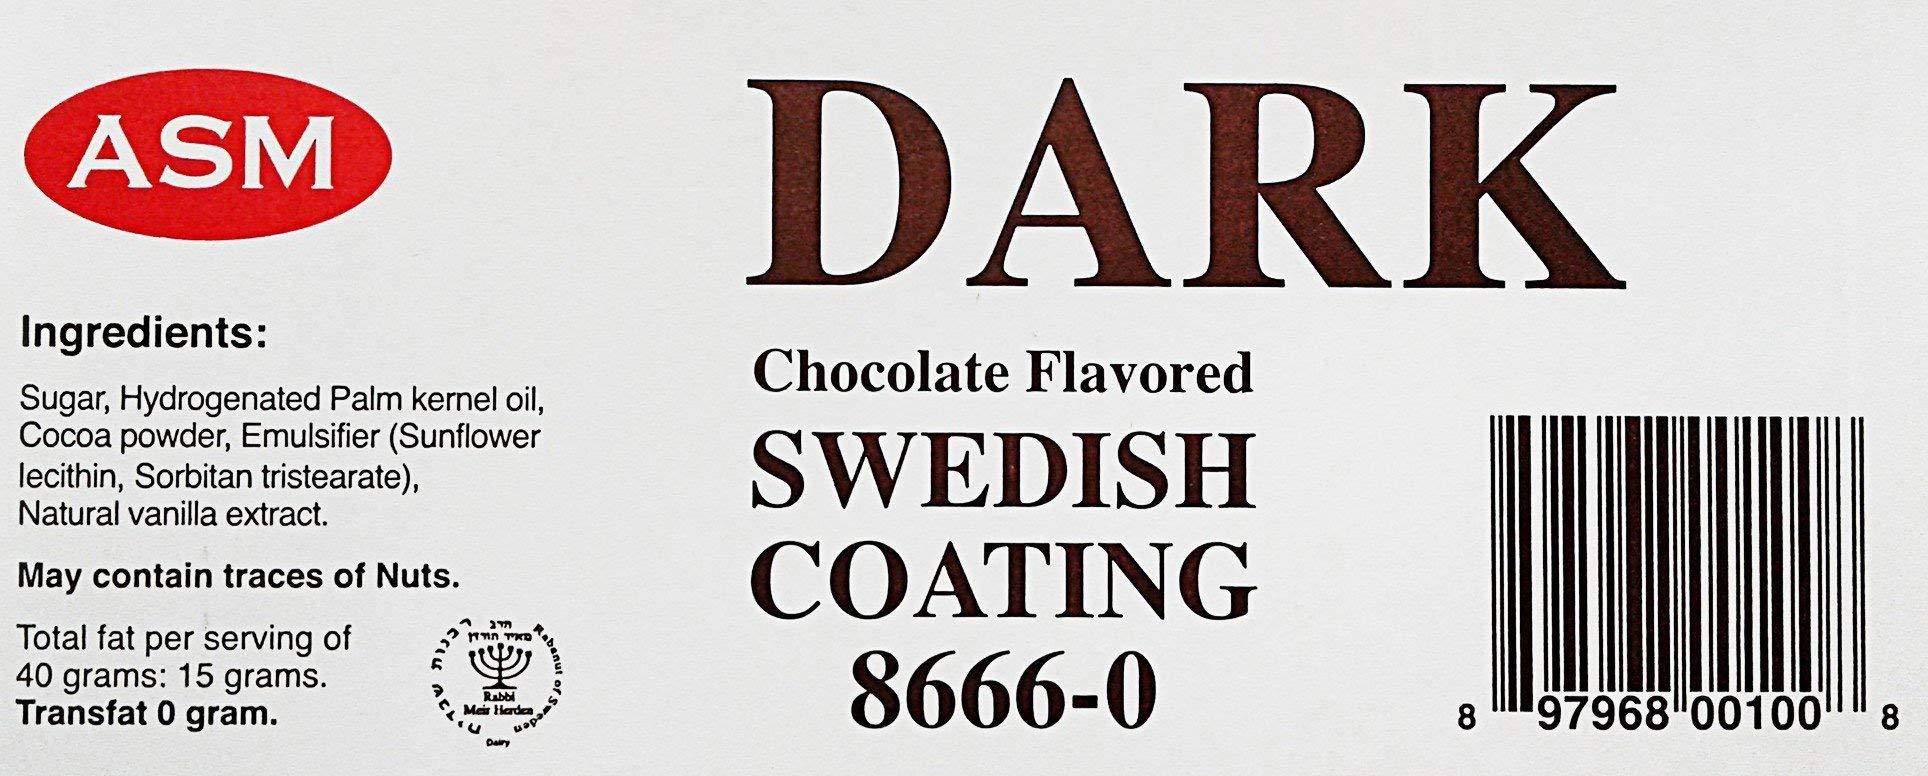 ASM Dark Chocolate Flavored Swedish Coating - Case: Six 11 lb Bars)